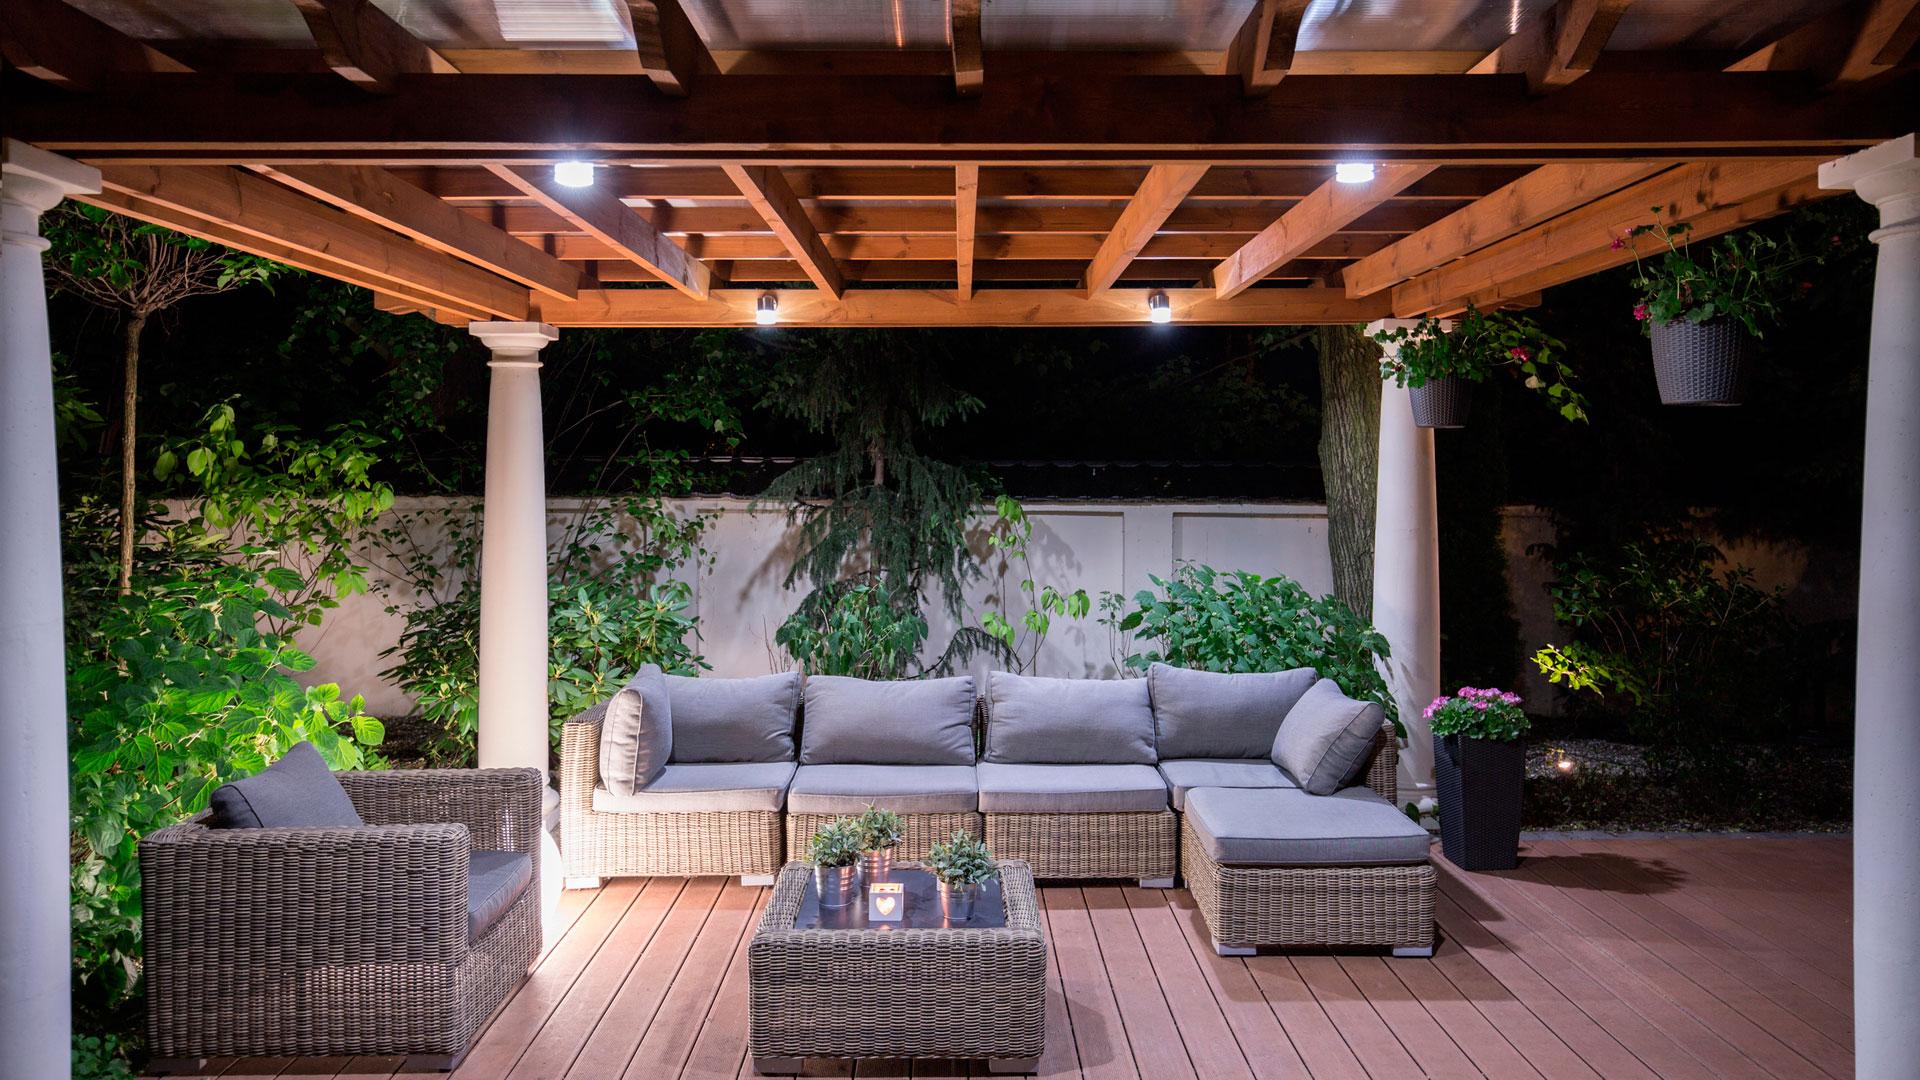 Gazebi da giardino in legno e ferro battuto ville casali for Arredo giardino ipercoop 2017